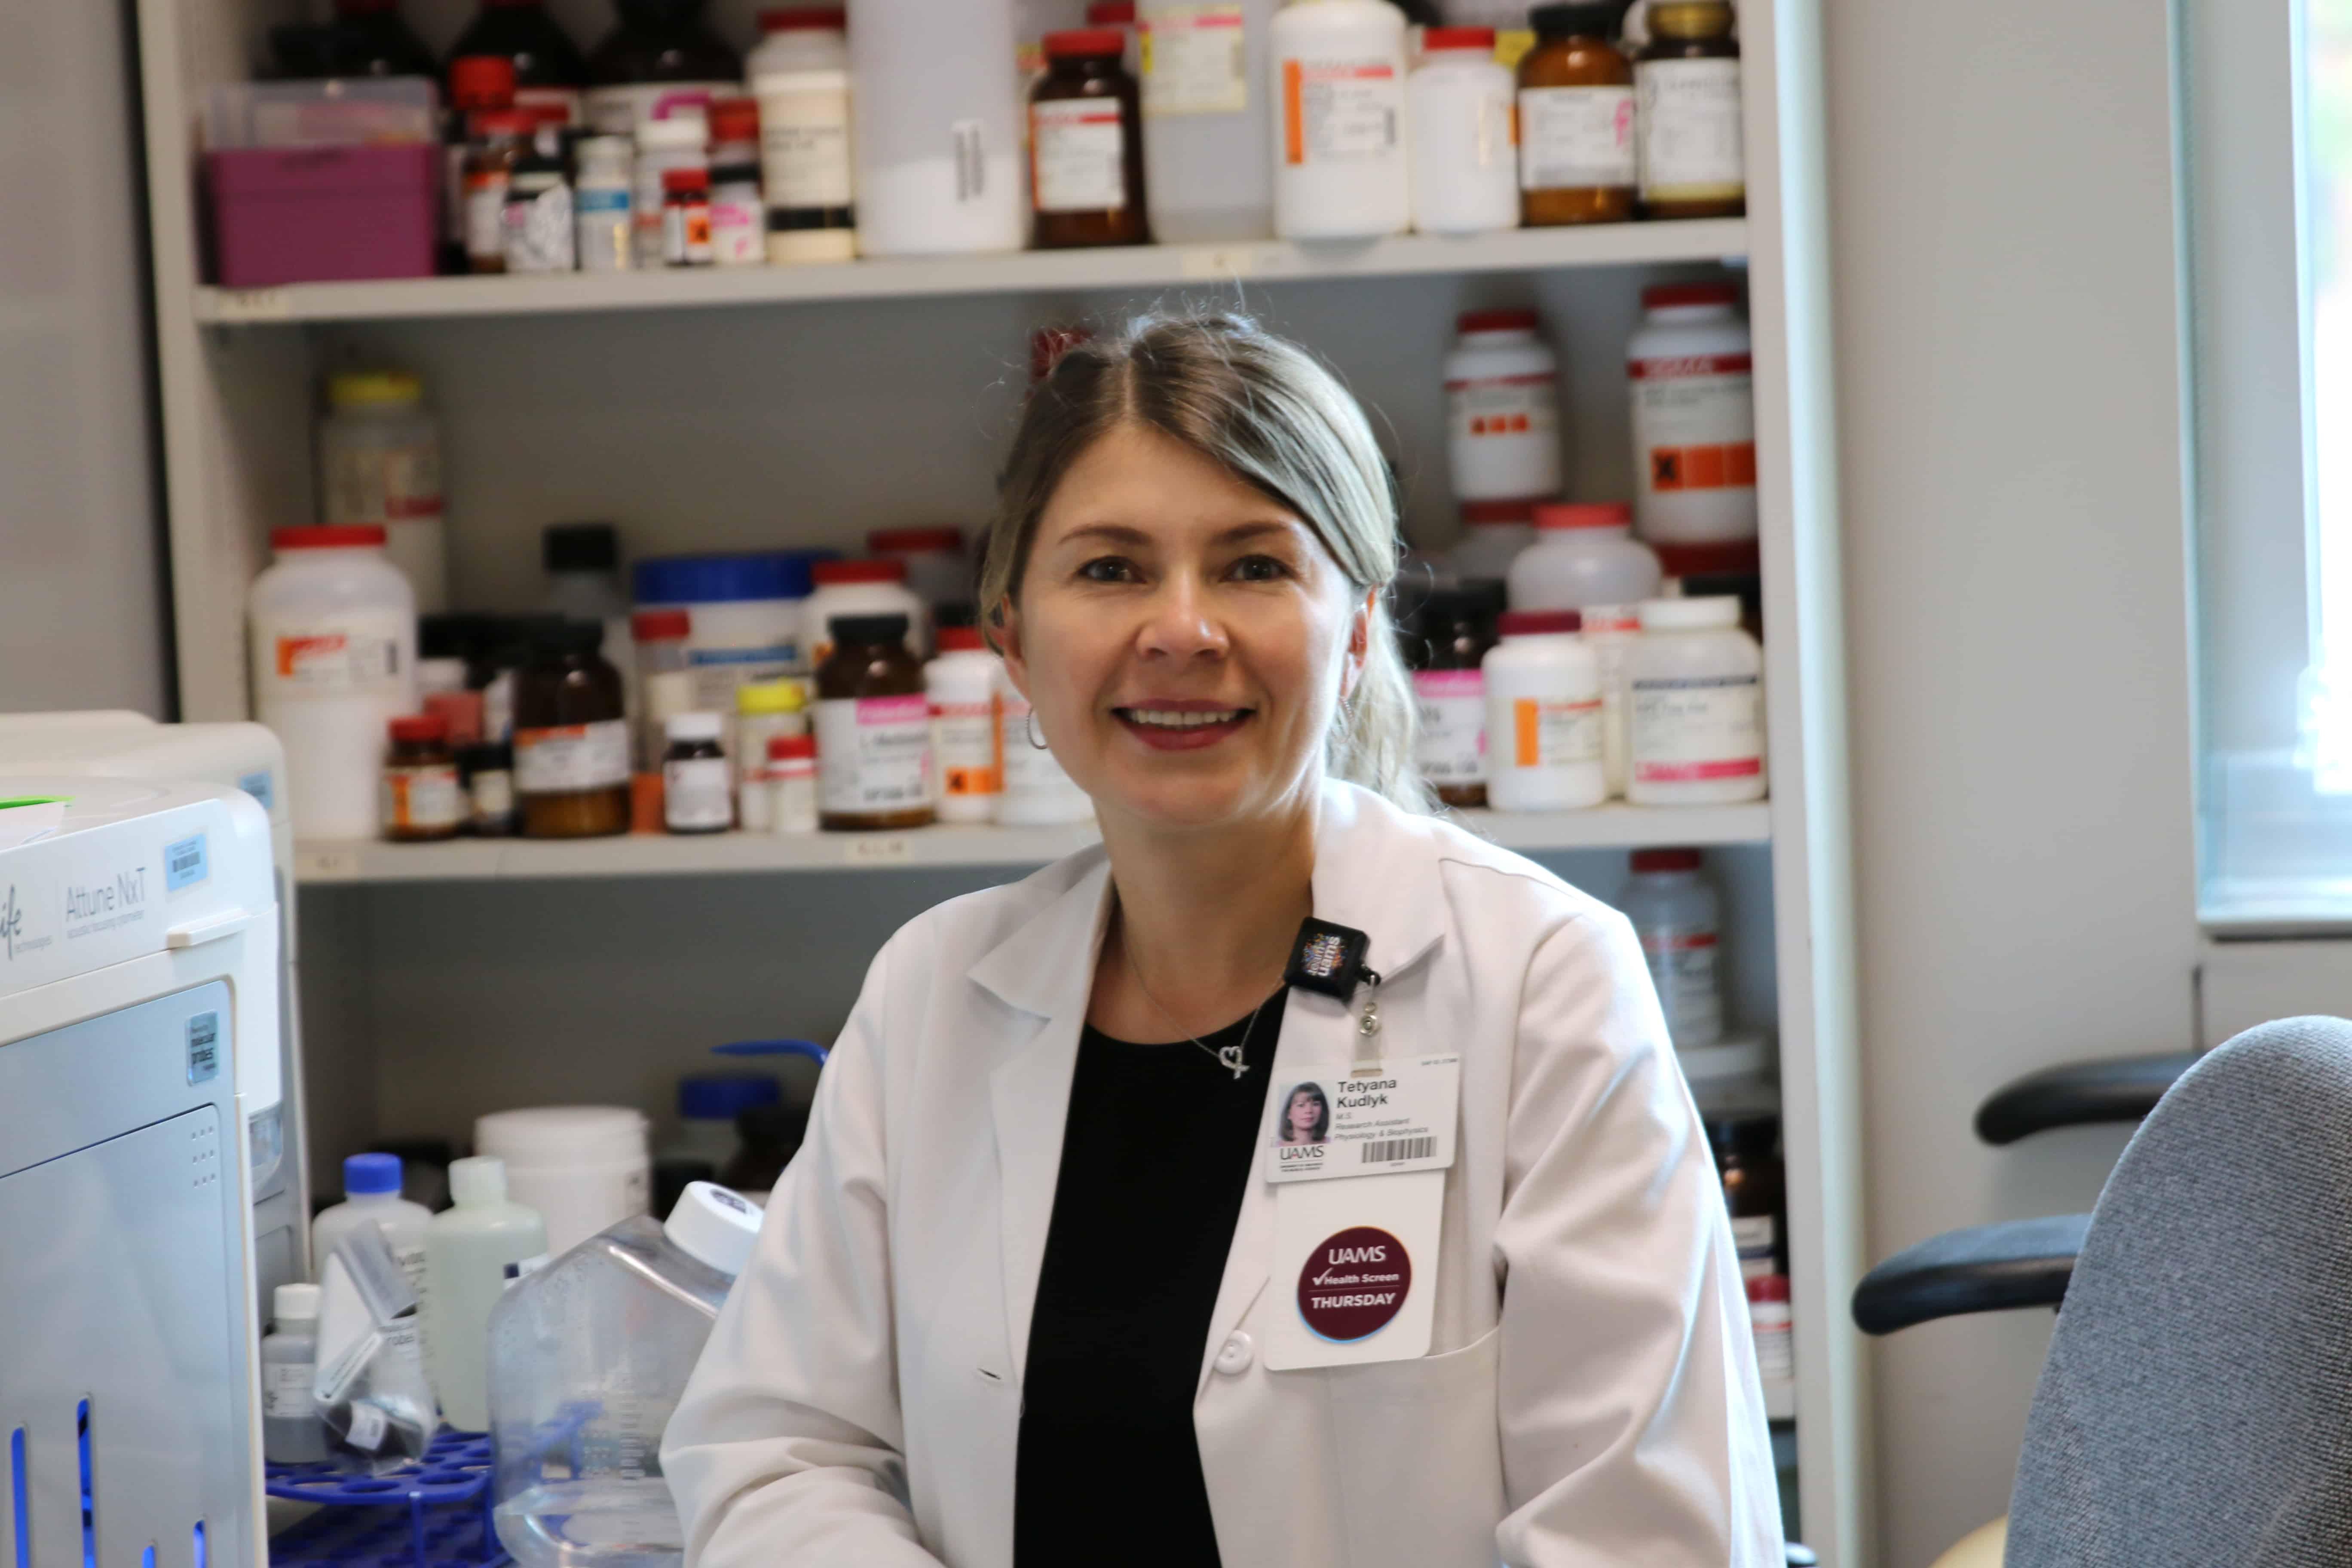 Tetyana Kudlyk, research associate